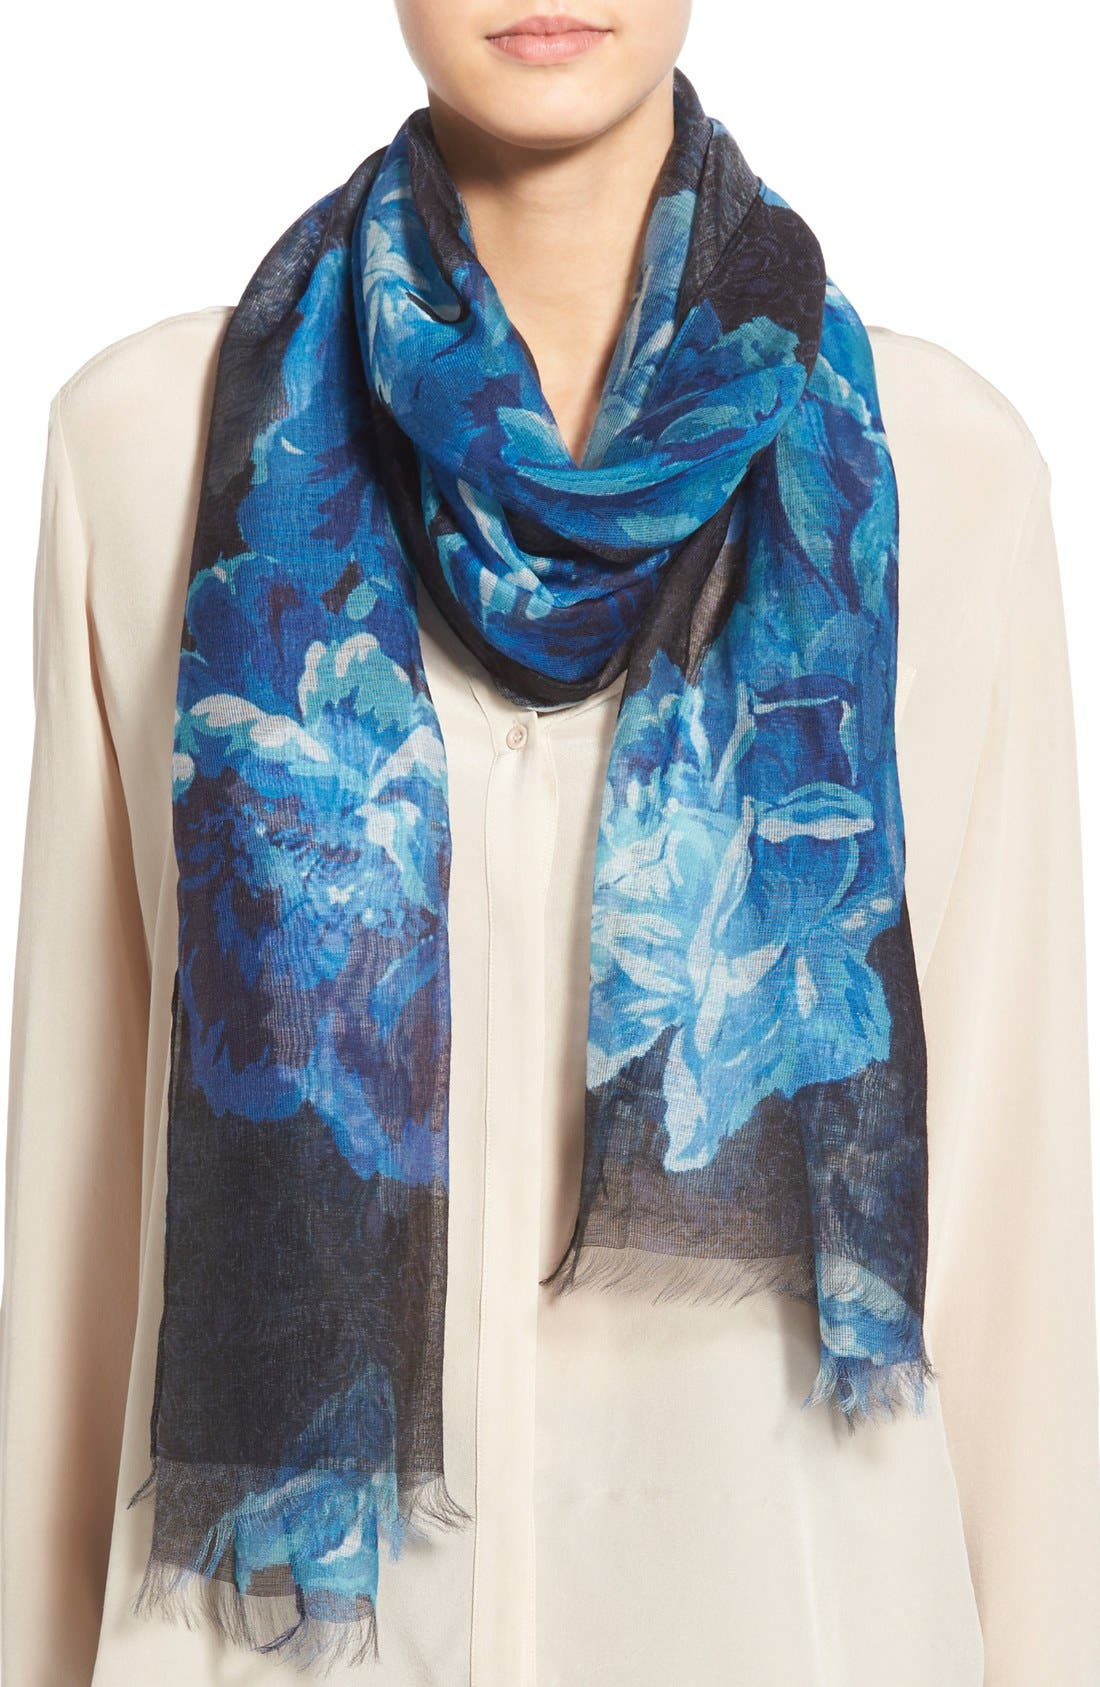 Main Image - Badgley Mischka 'Sheer Rose' Floral Print Modal & Silk Scarf